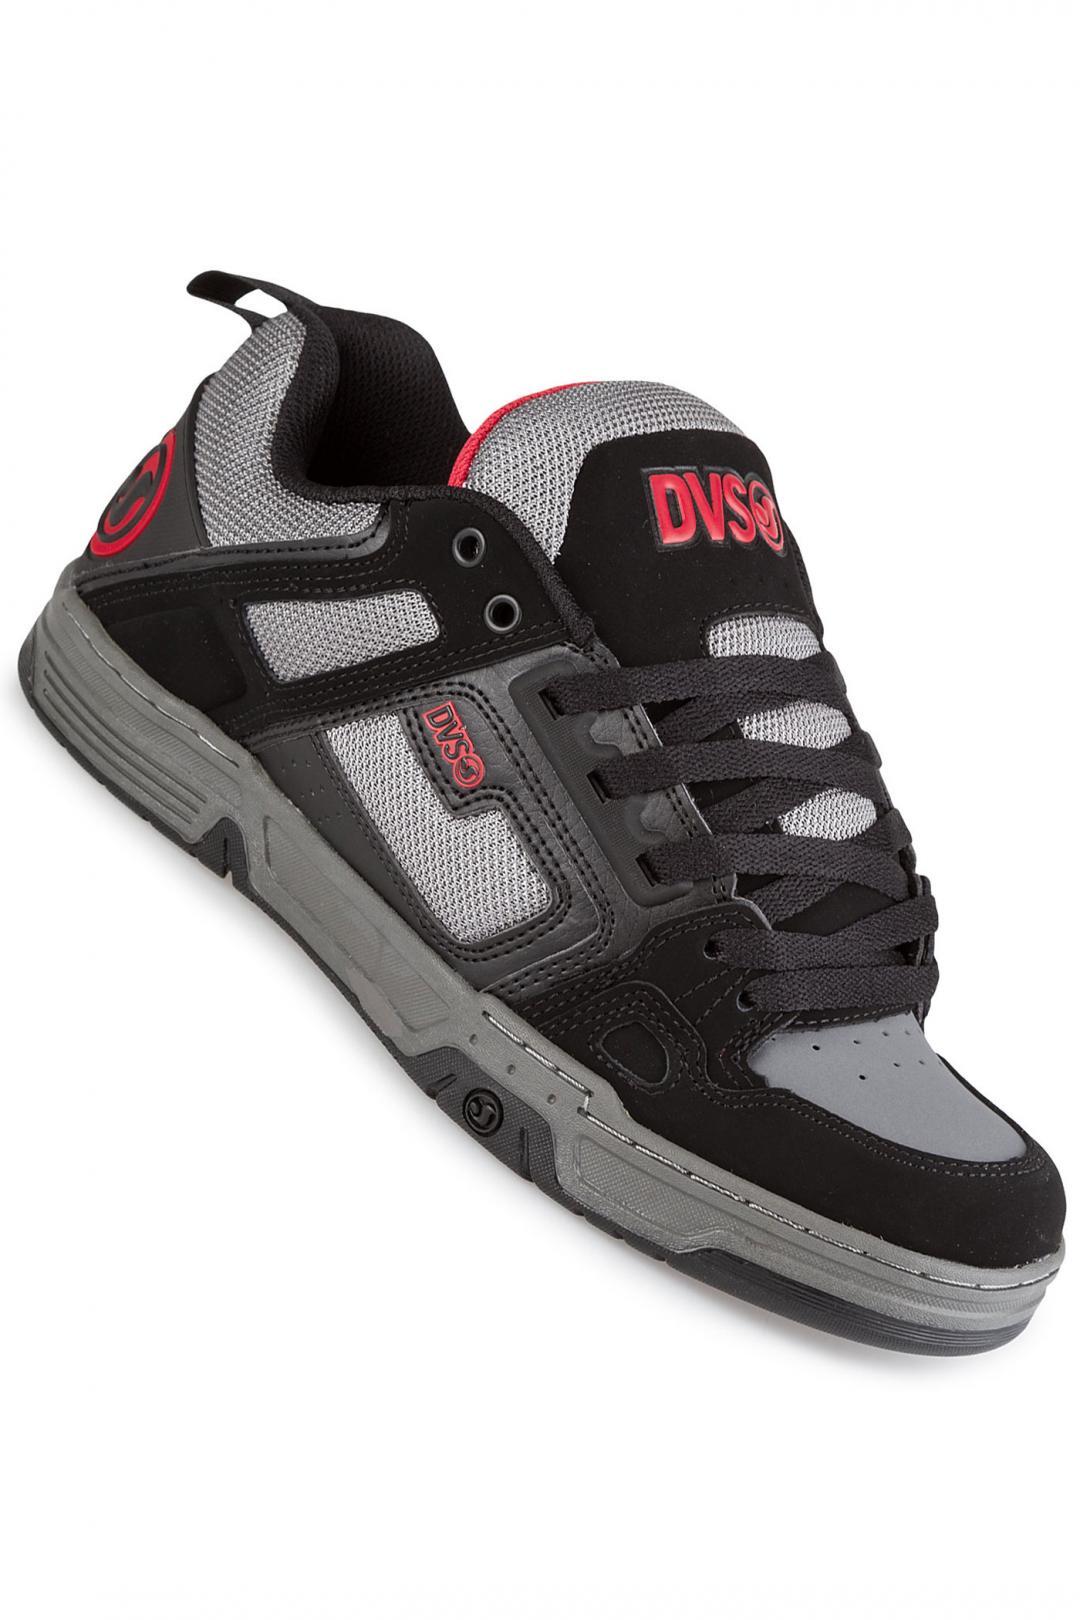 Uomo DVS Comanche Leather Nubuck black charcoal | Sneaker